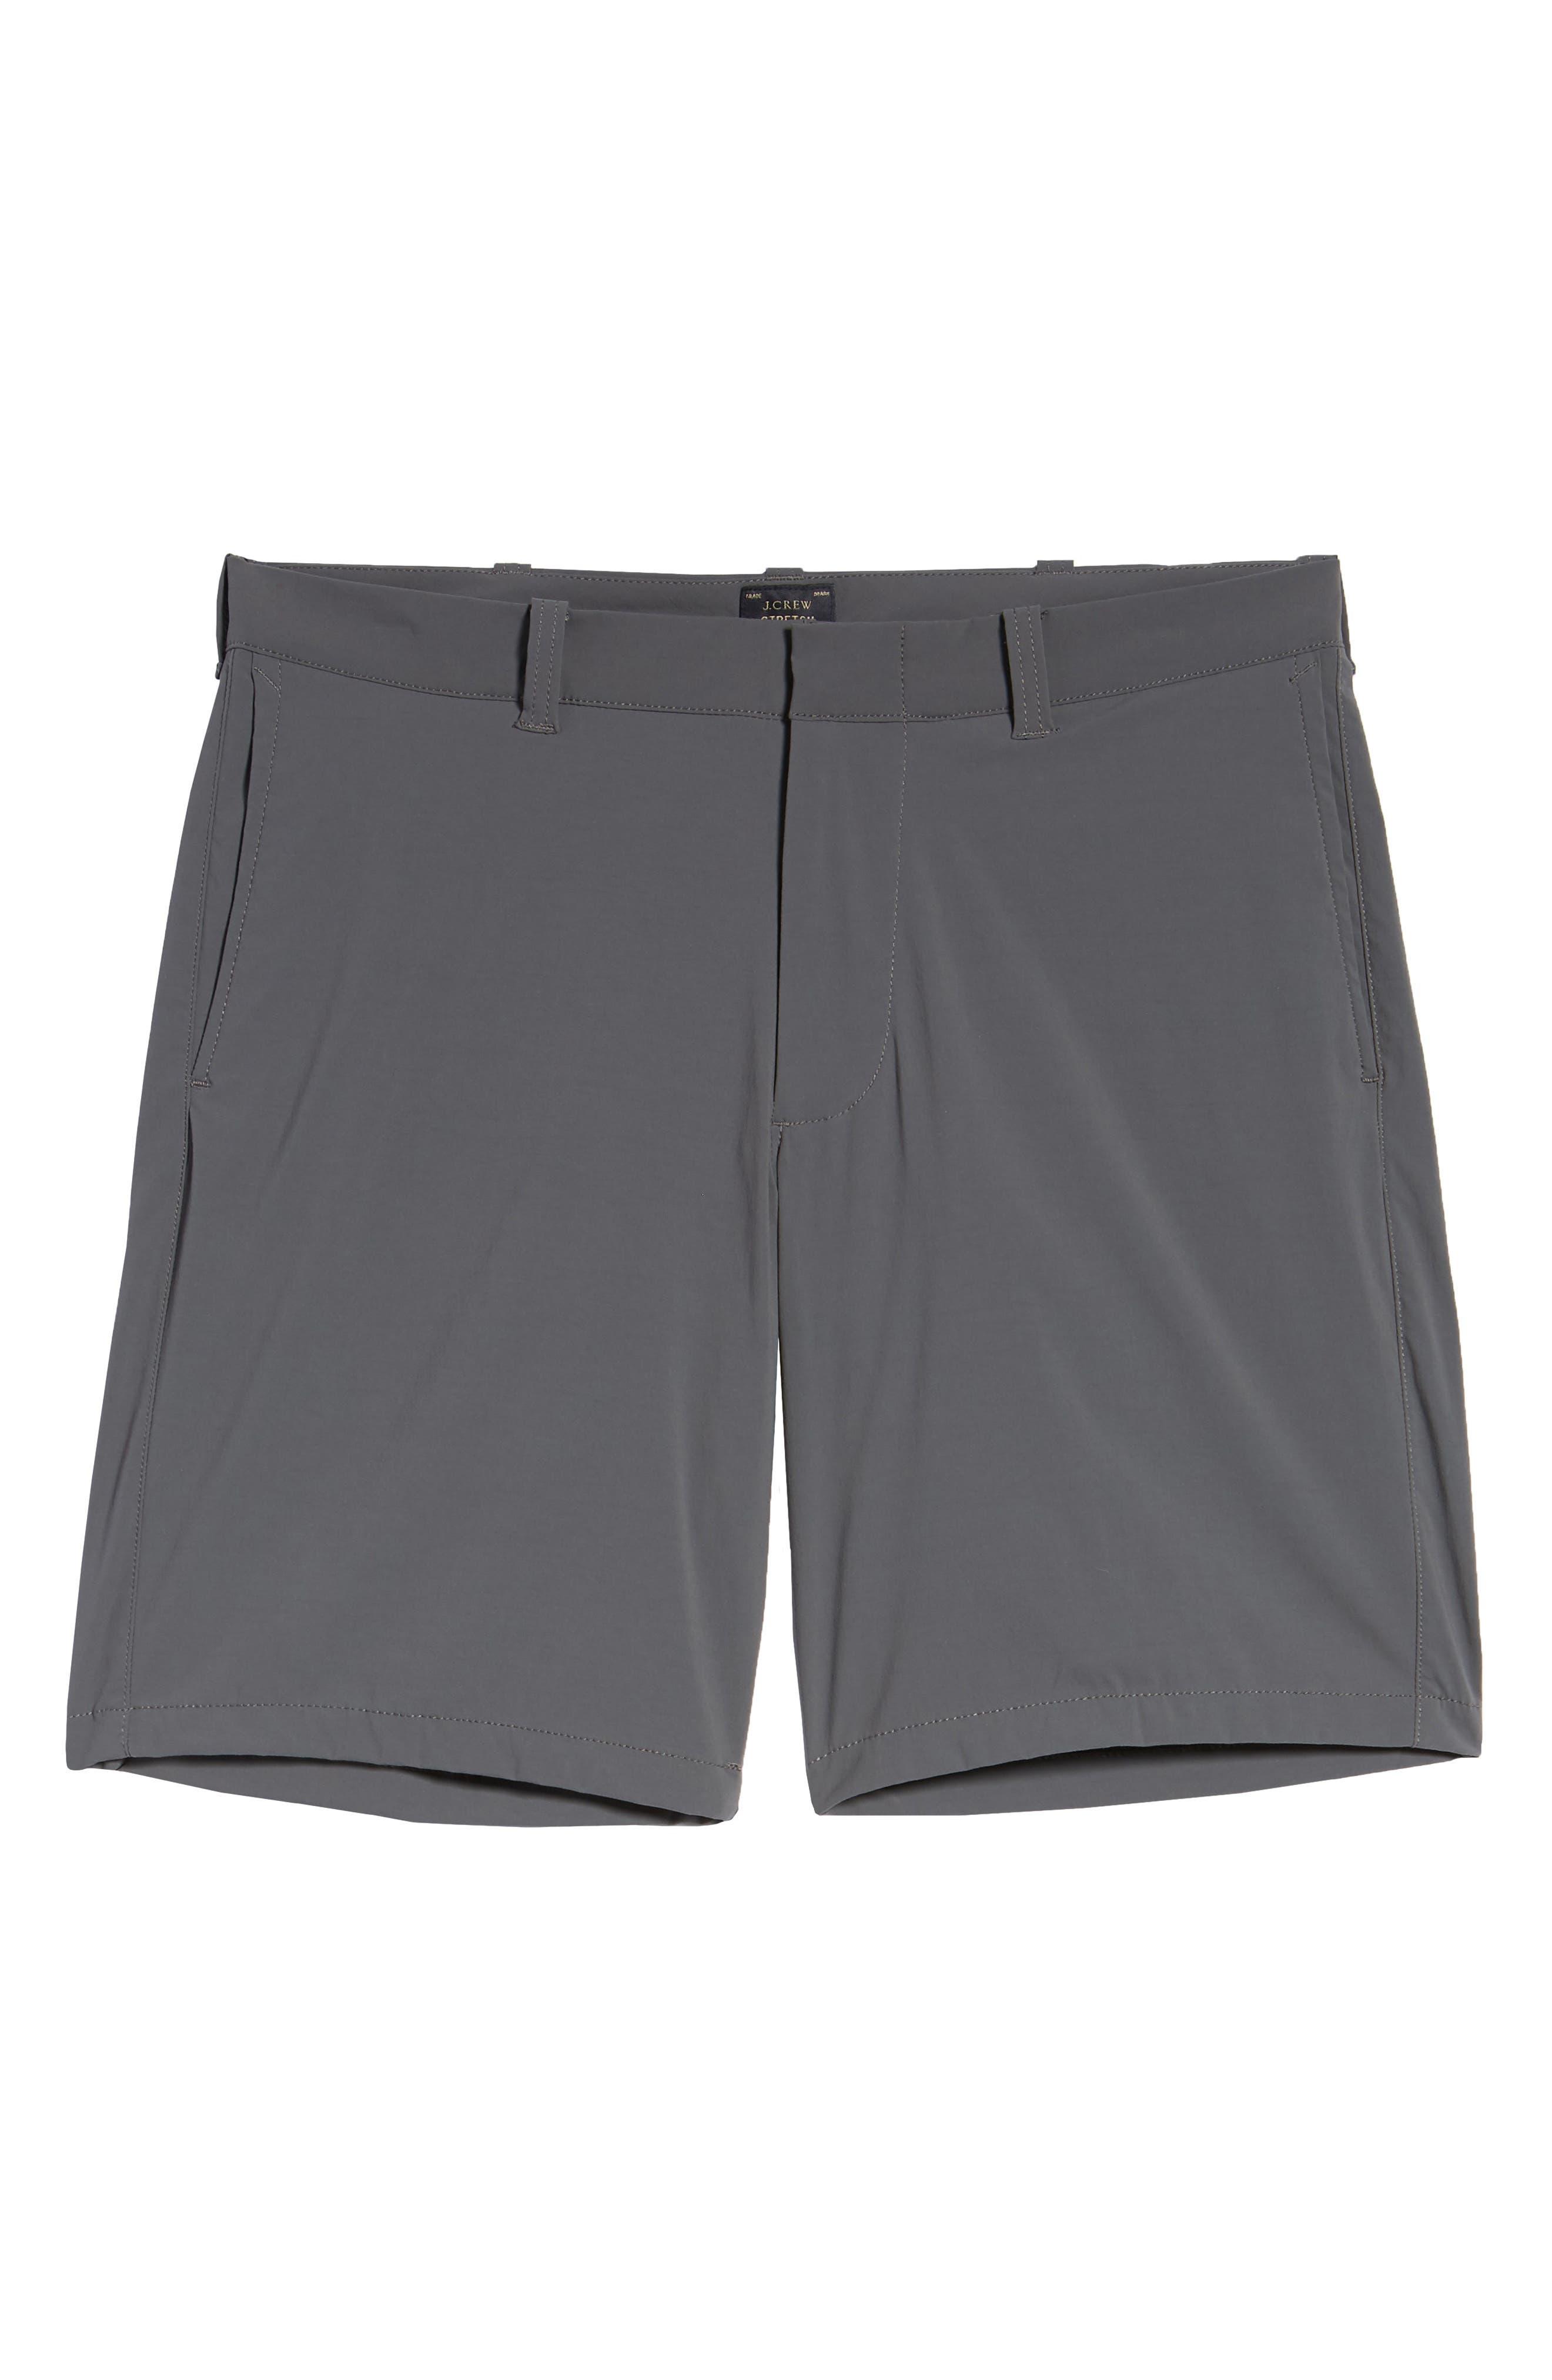 Tech Shorts,                             Alternate thumbnail 6, color,                             020